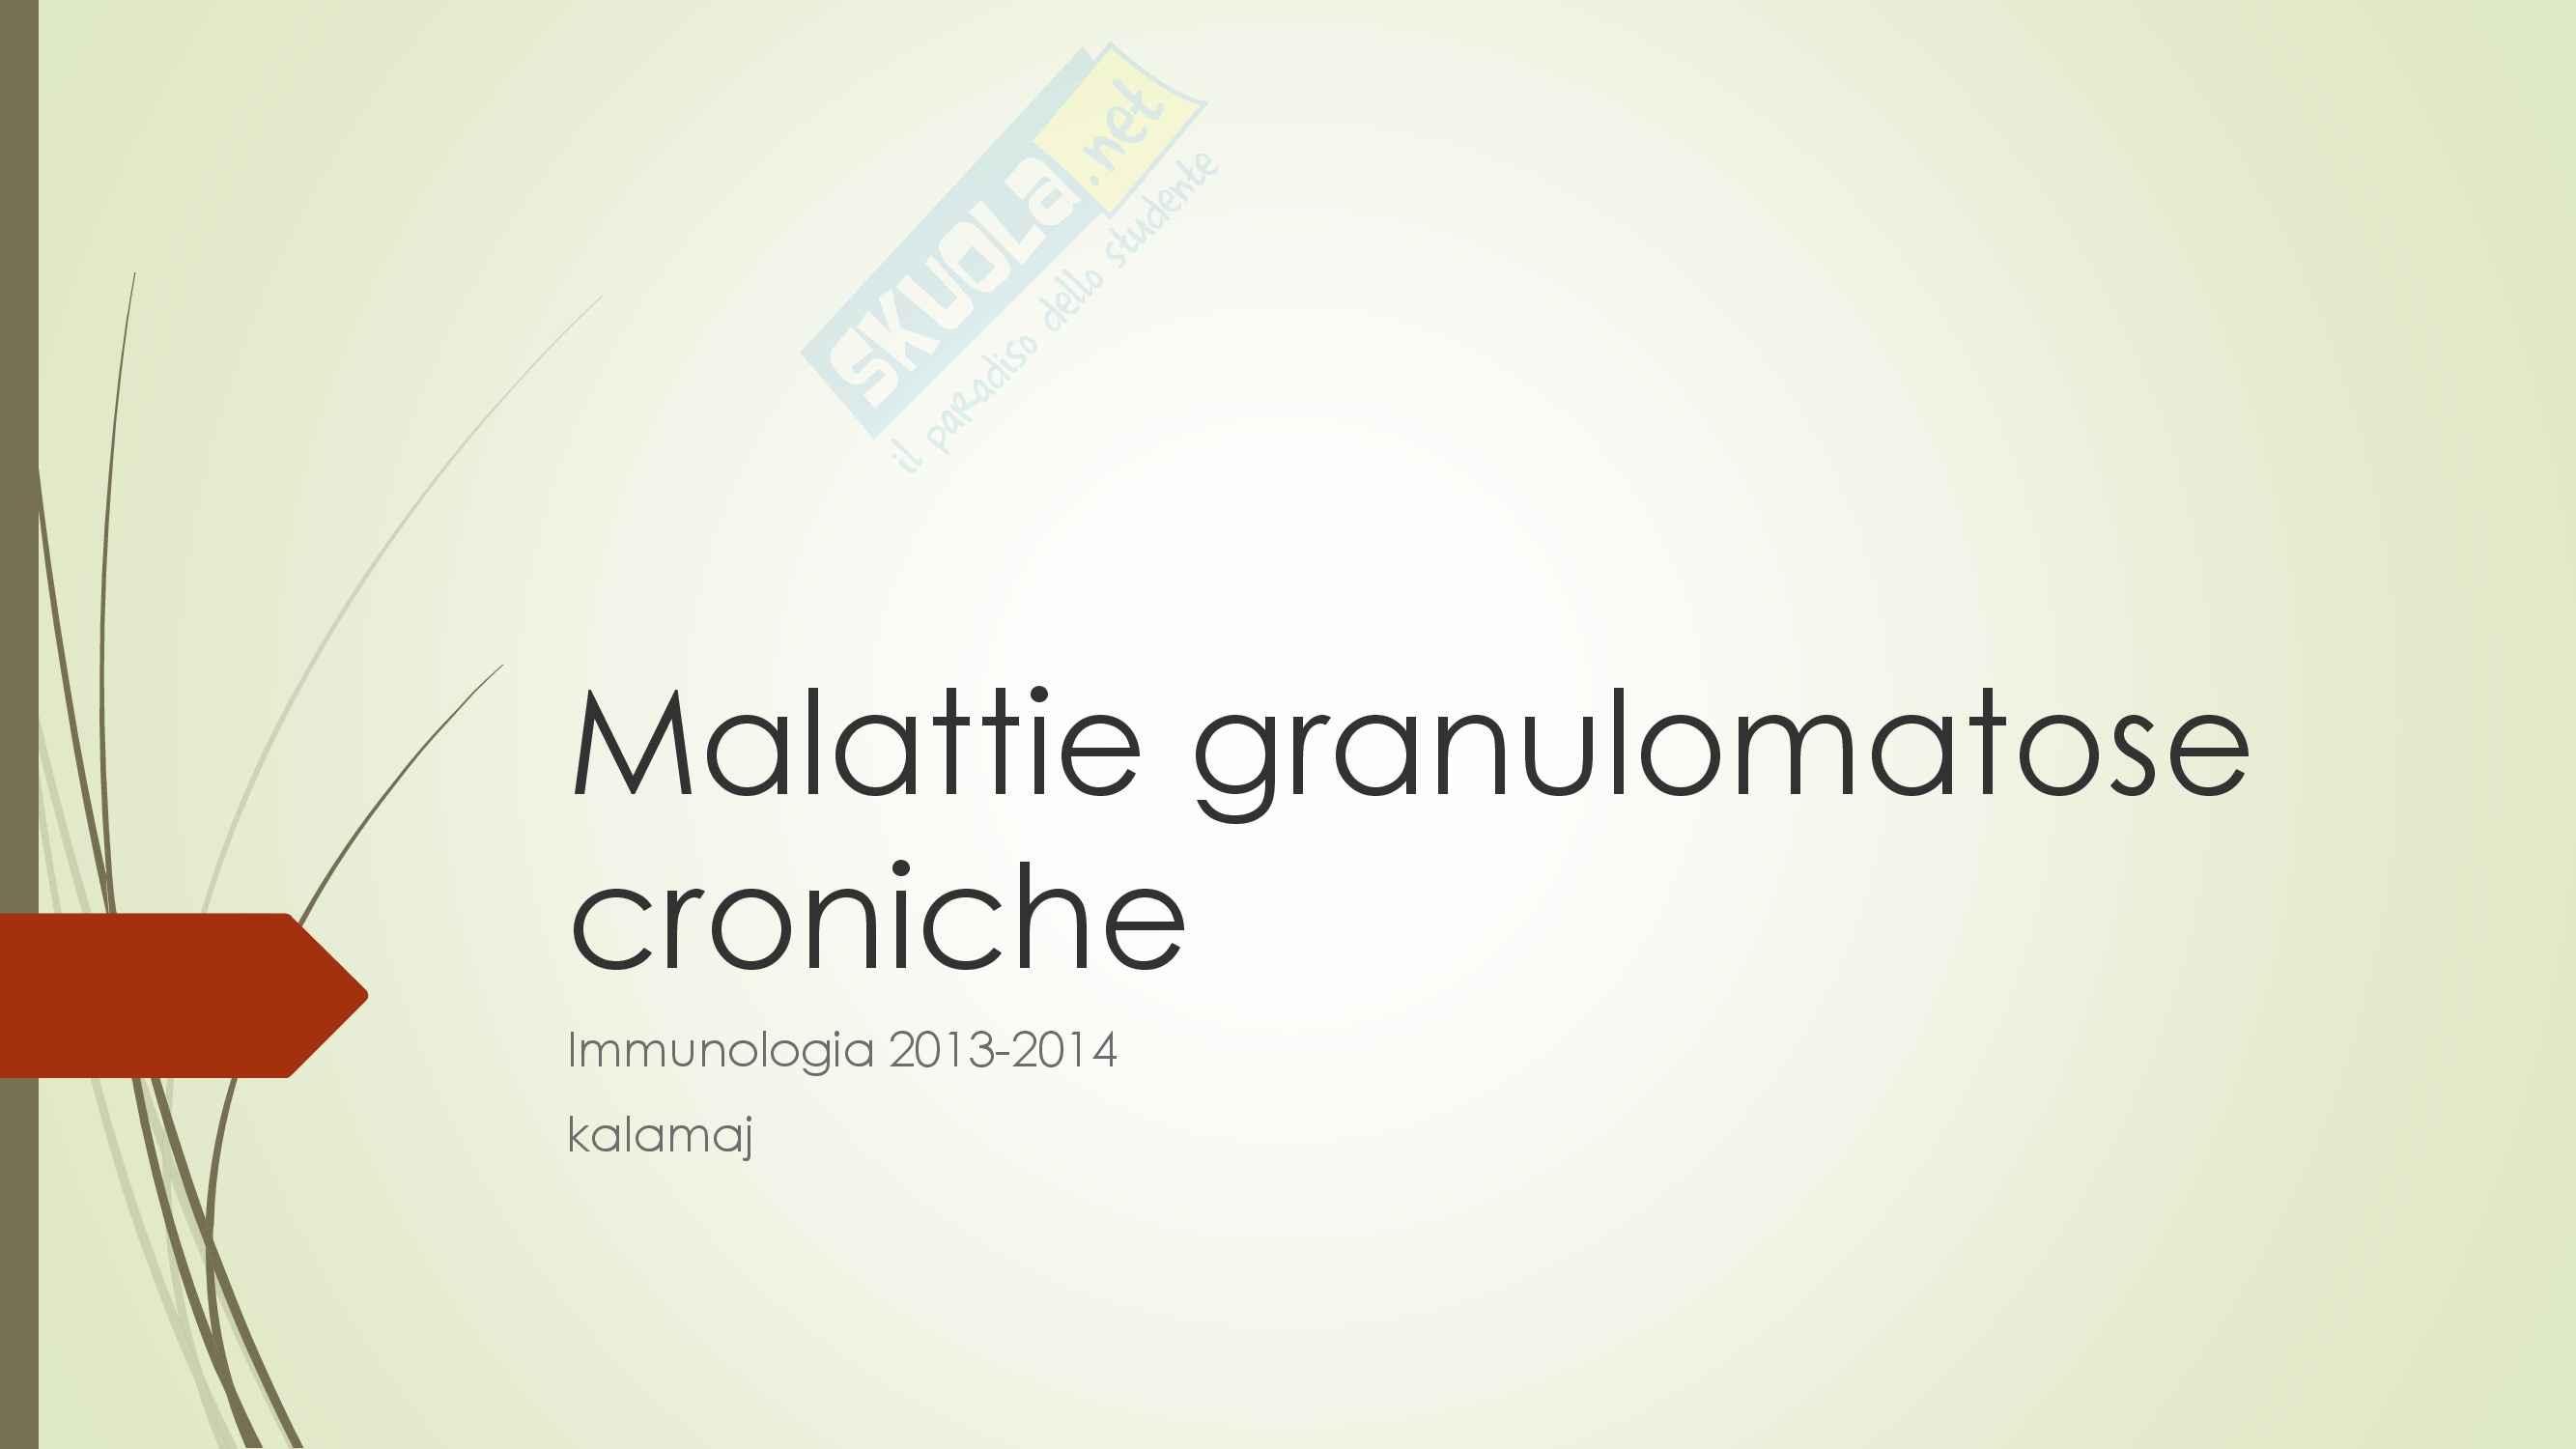 Immunologia - Malattie granulomatose croniche